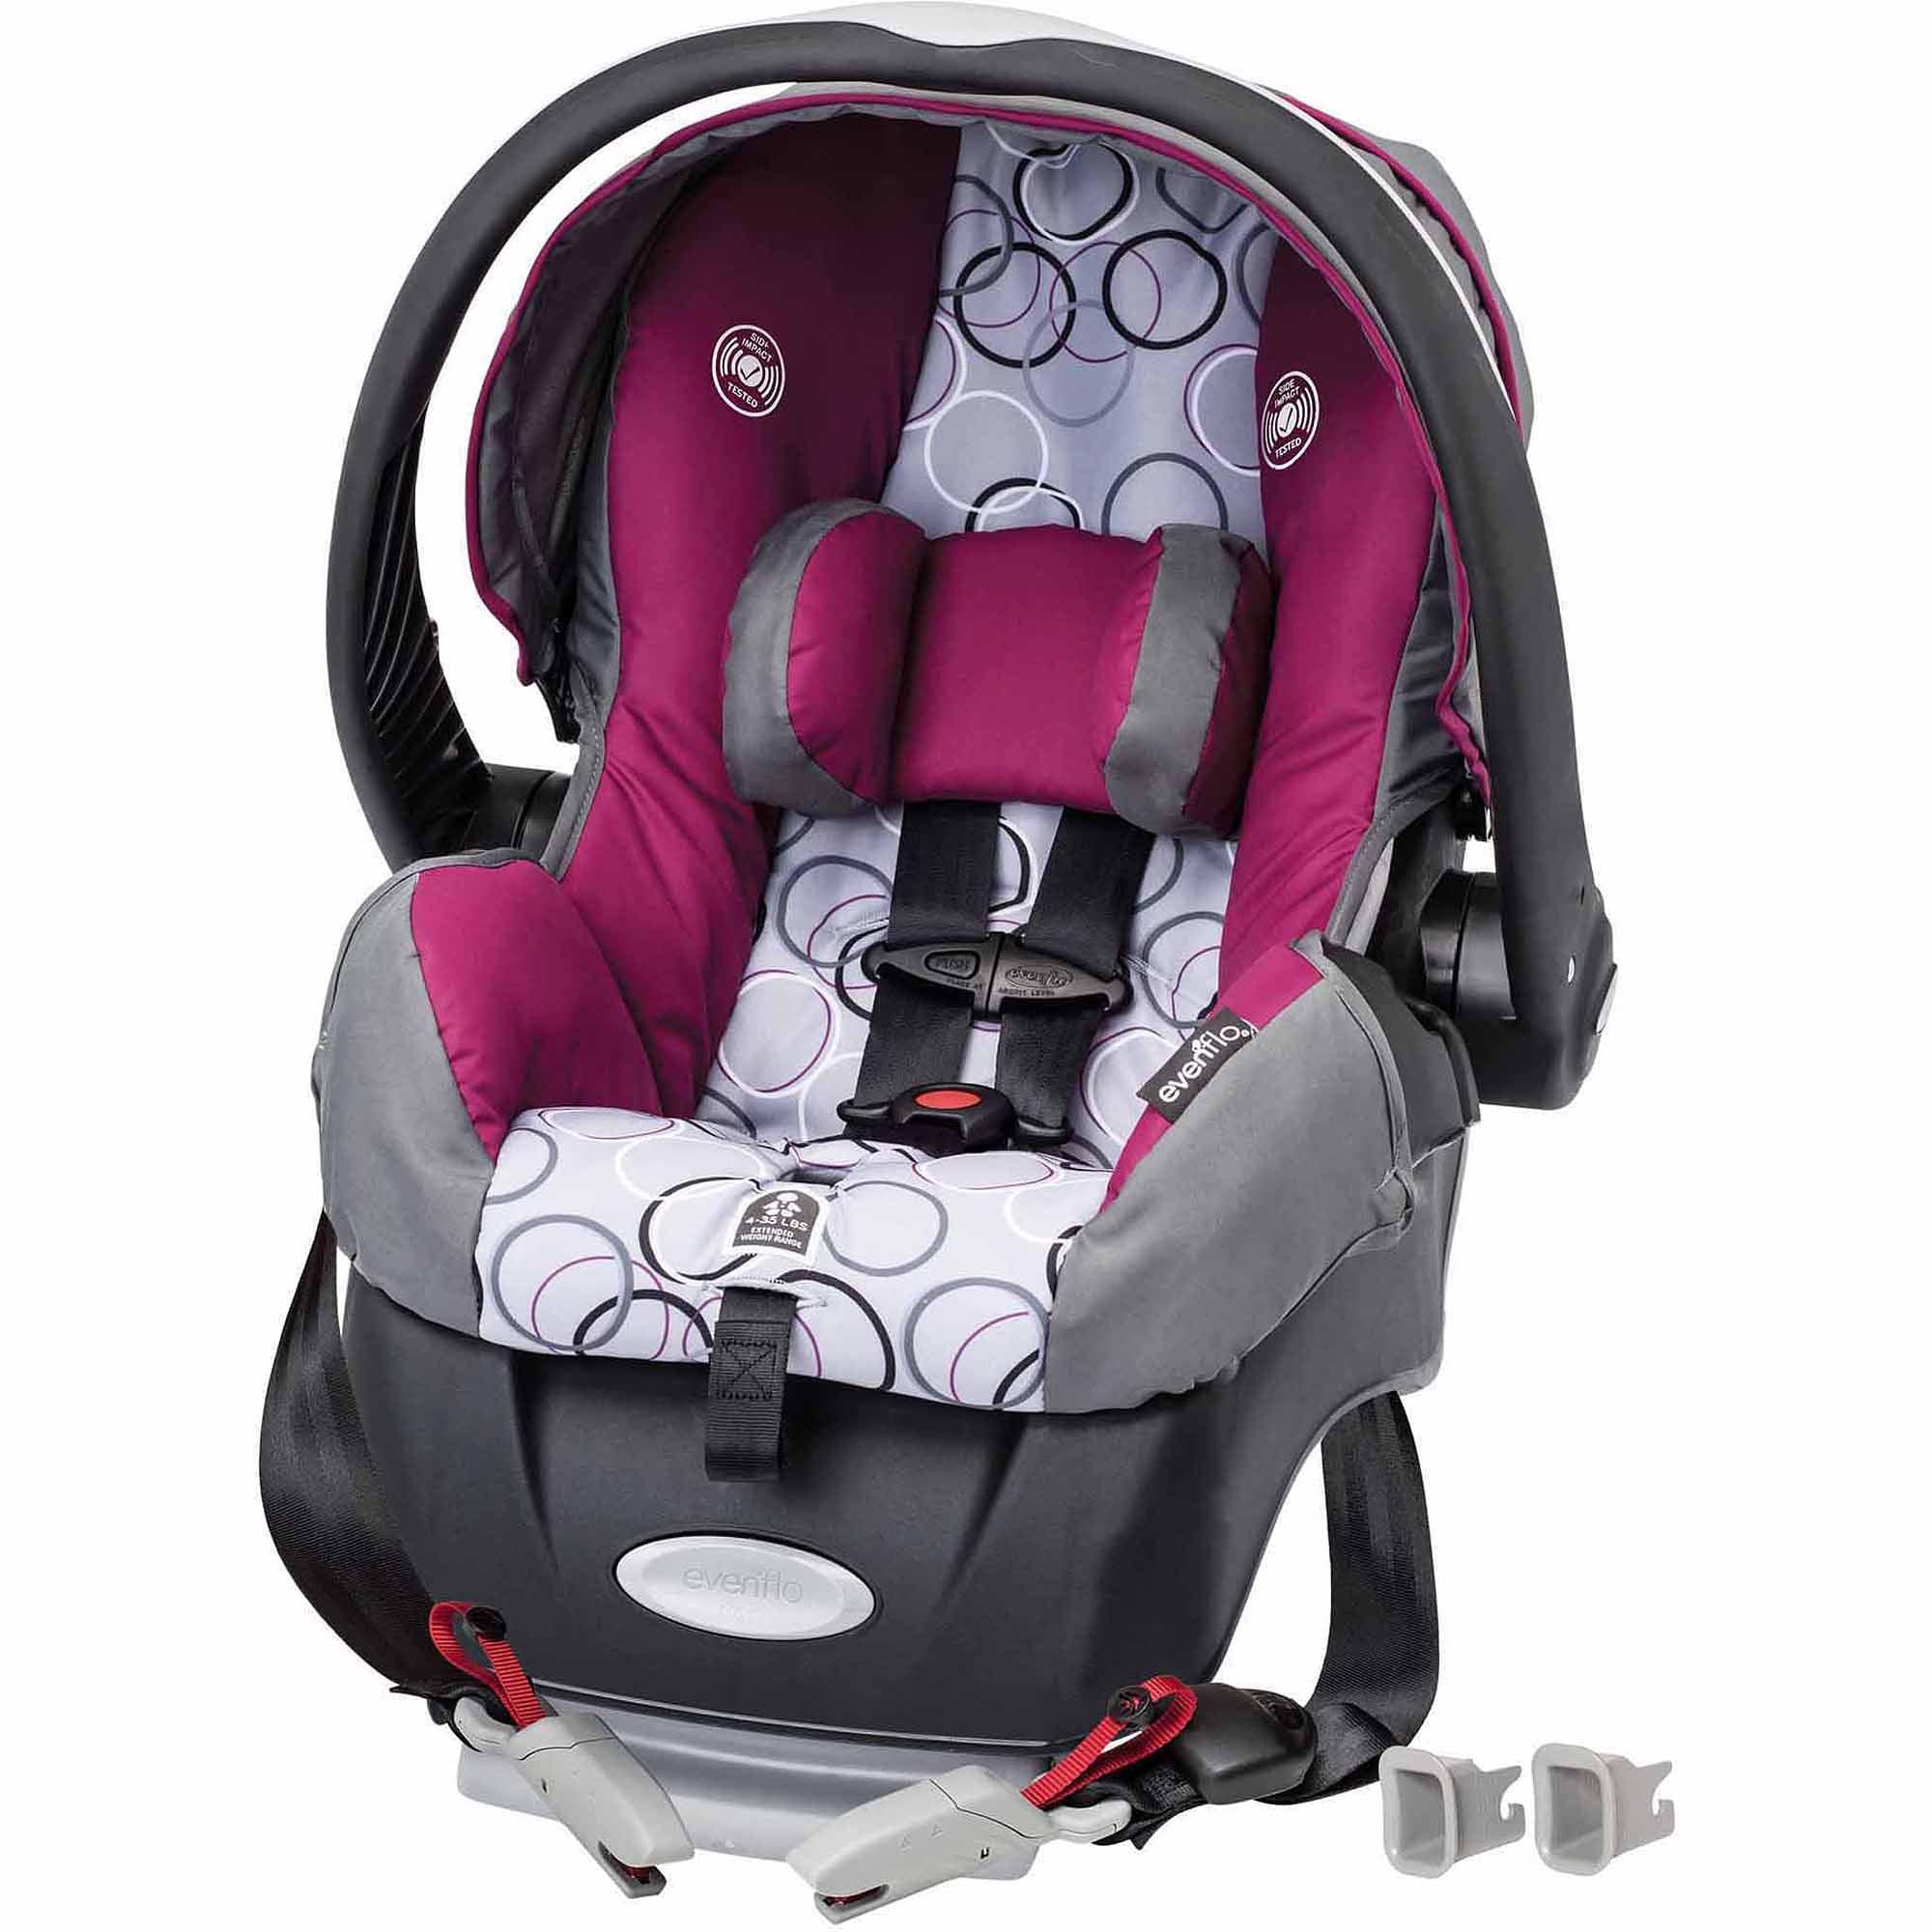 Evenflo Embrace Select Infant Car Seat w /  SureSafe Installation, Choose Your Pattern